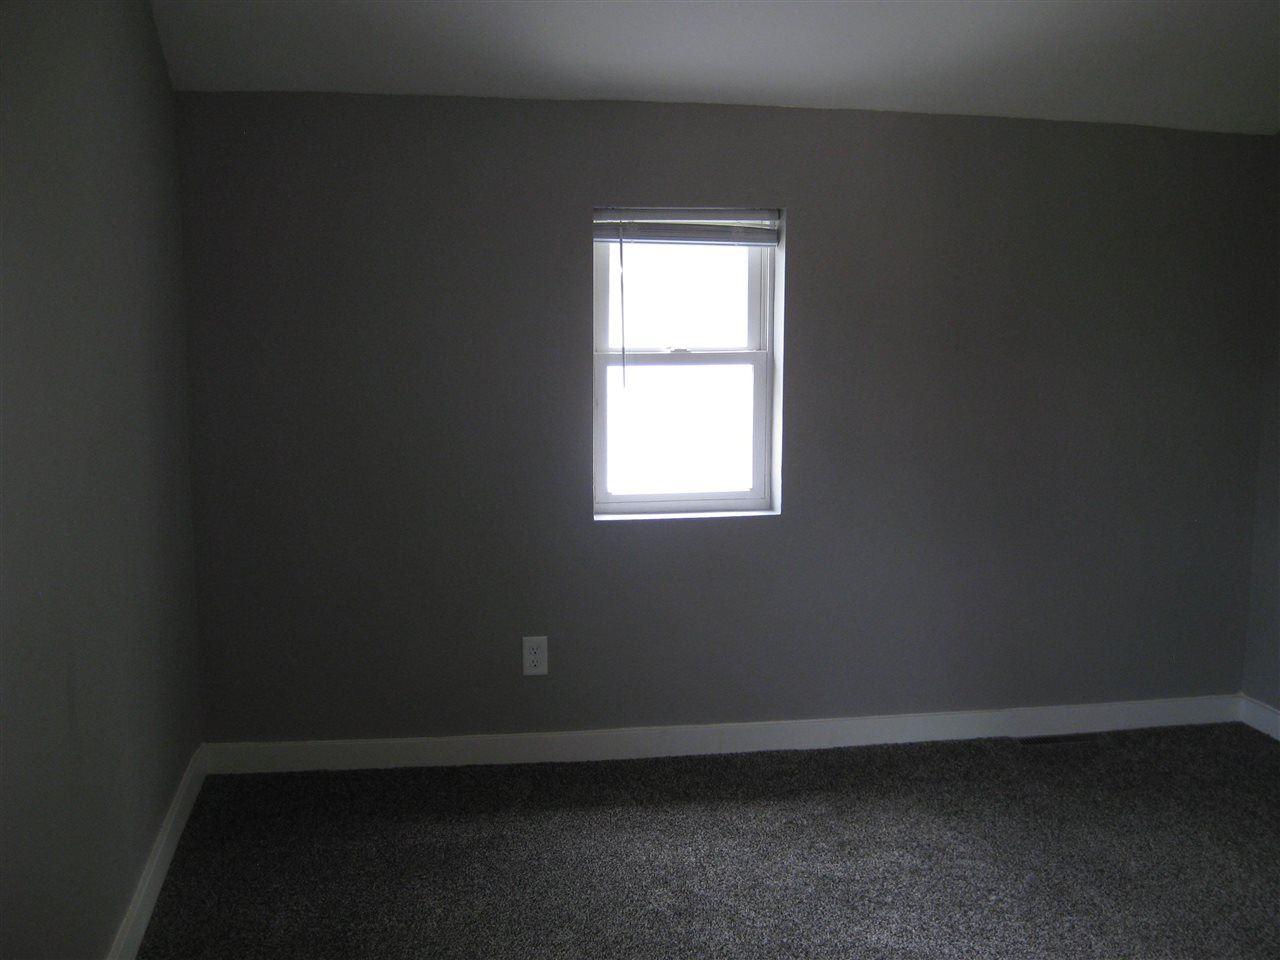 f_1913247_02 Real Estate in 53534 zip code